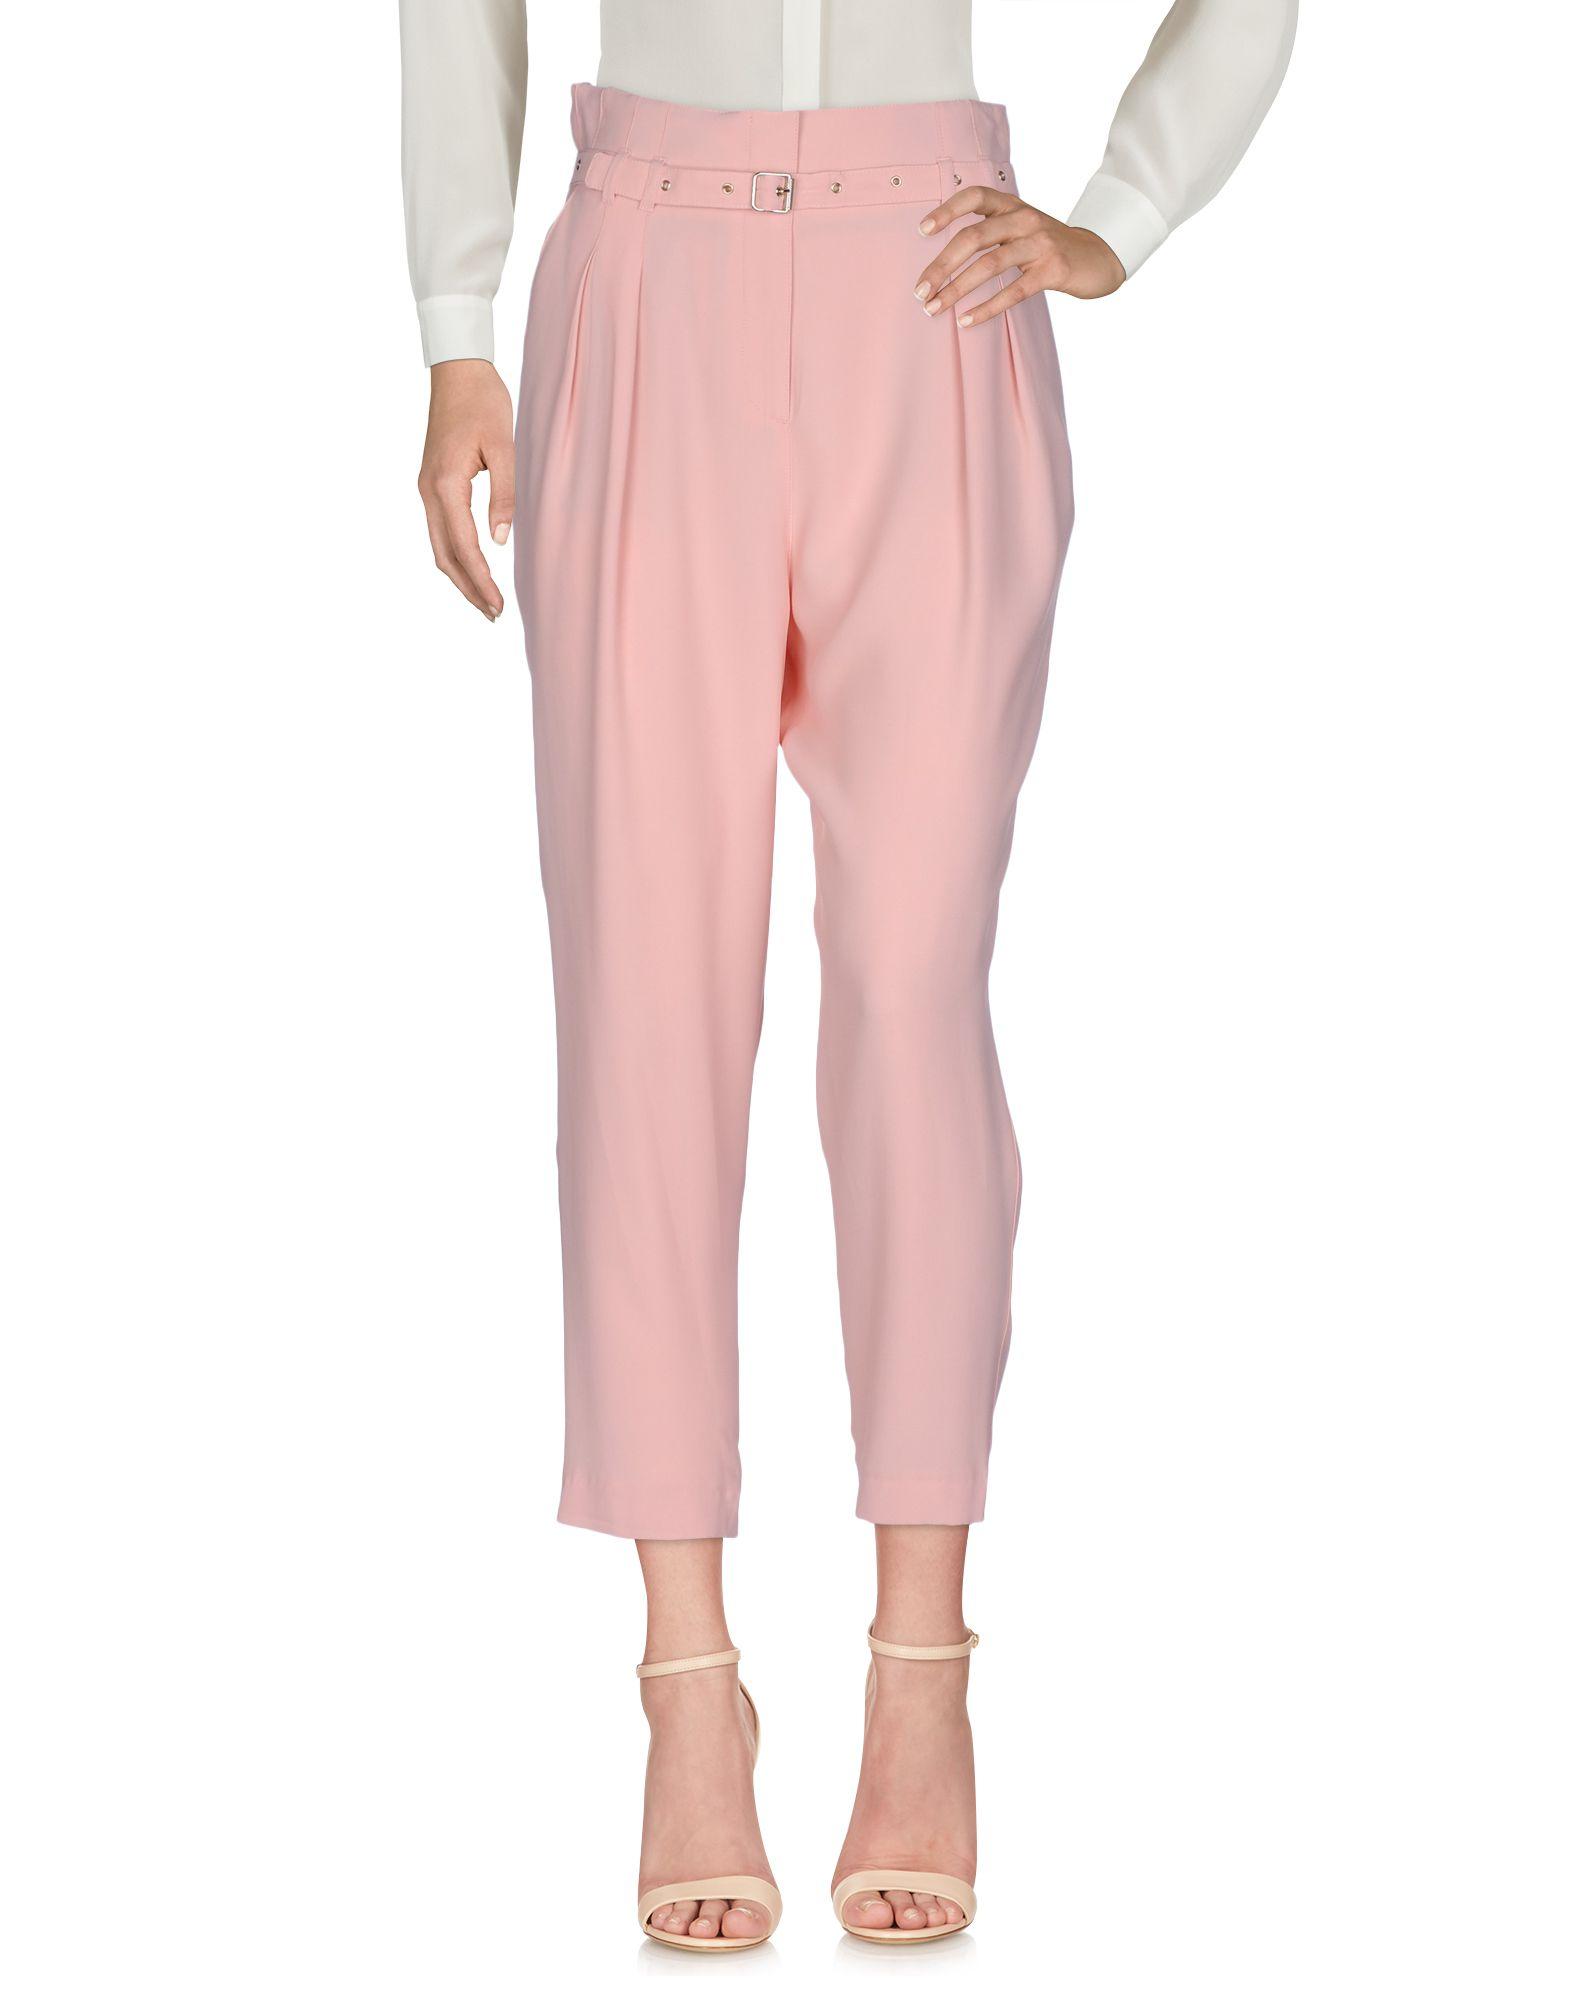 Pantalone Atos Lombardini Donna - Acquista online su AUmYI